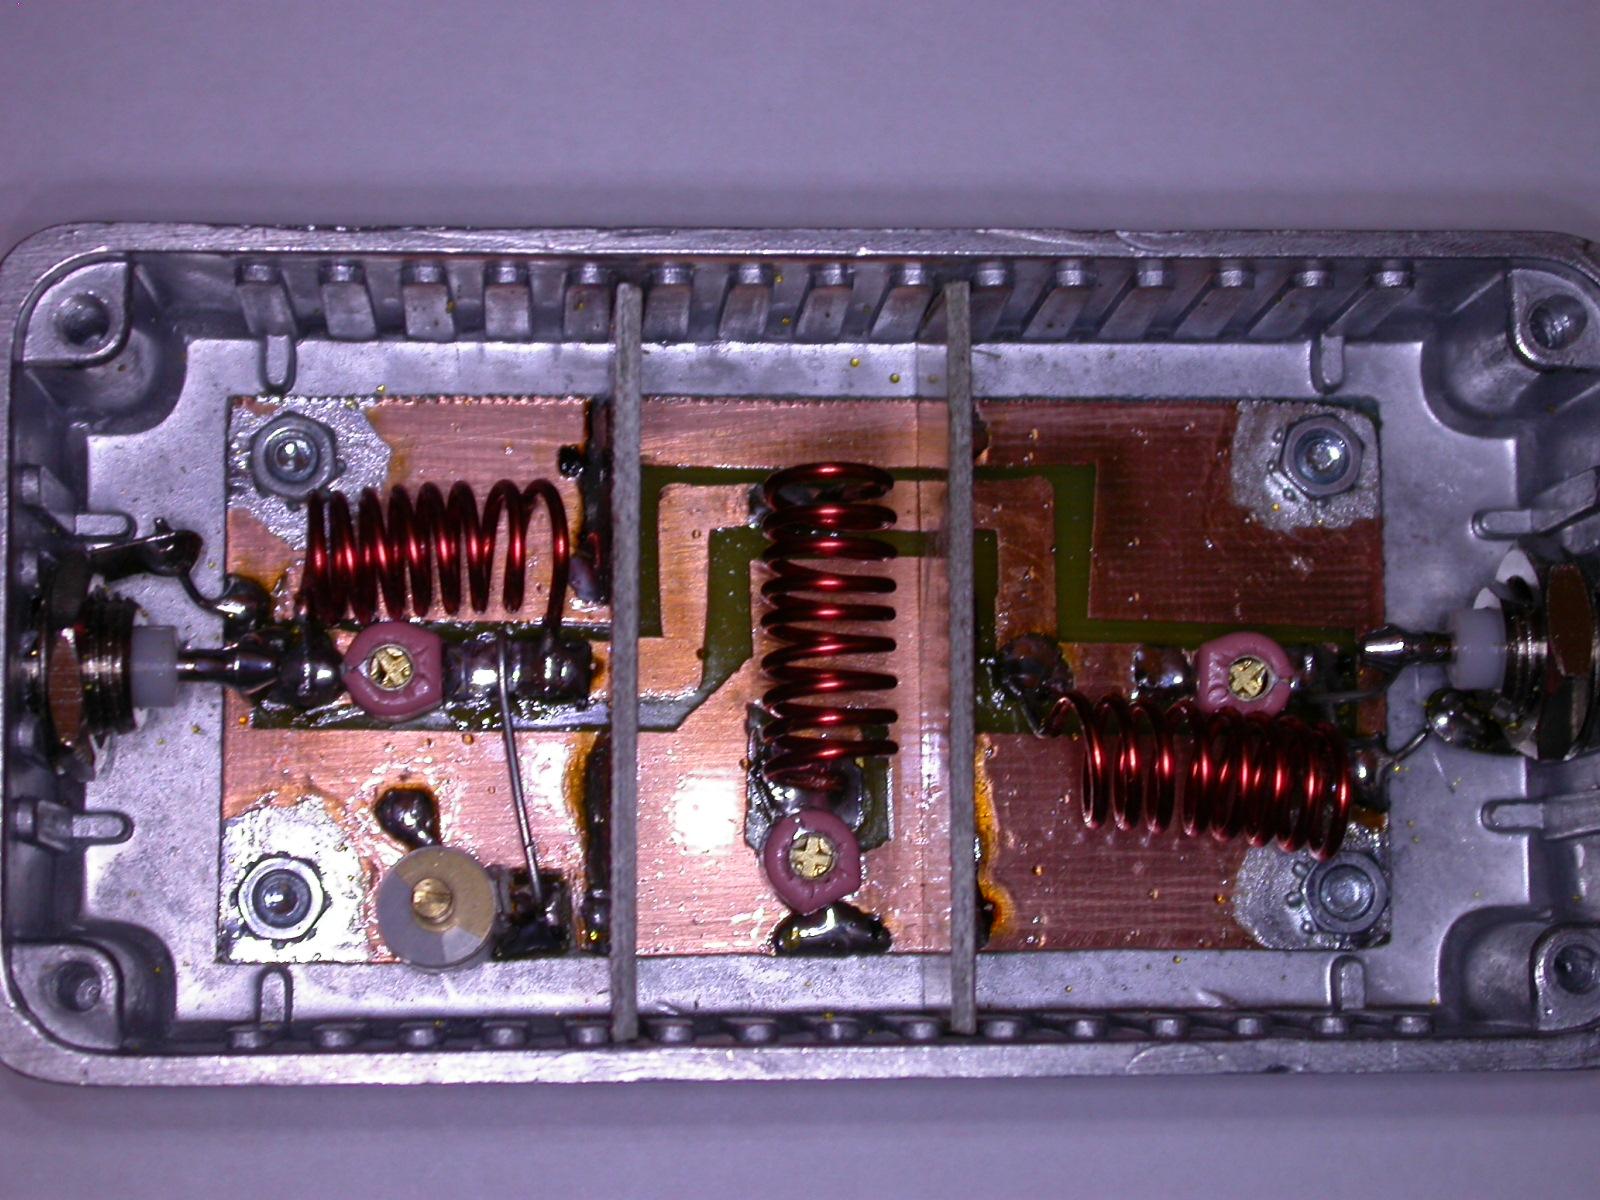 144 & 432 mhz filter